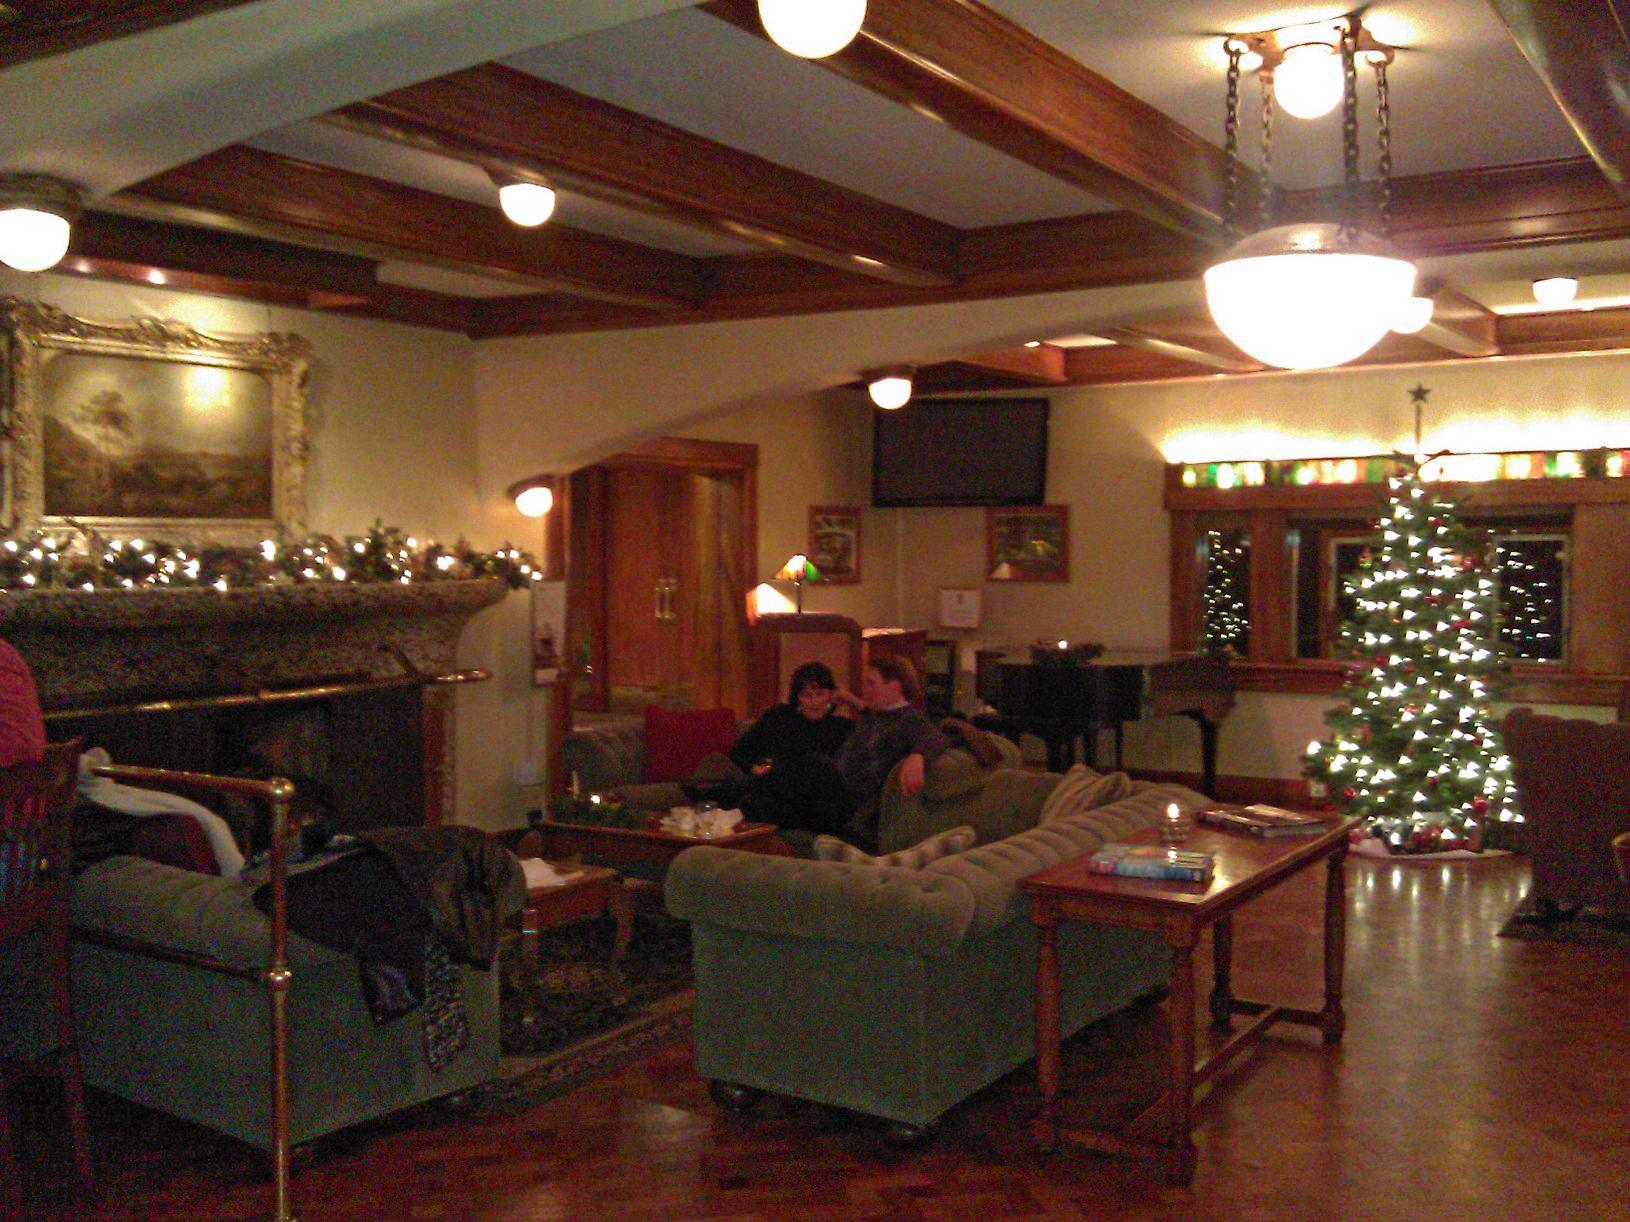 Living Room at Moran Mansion, Rosario Resort - Orcas Island